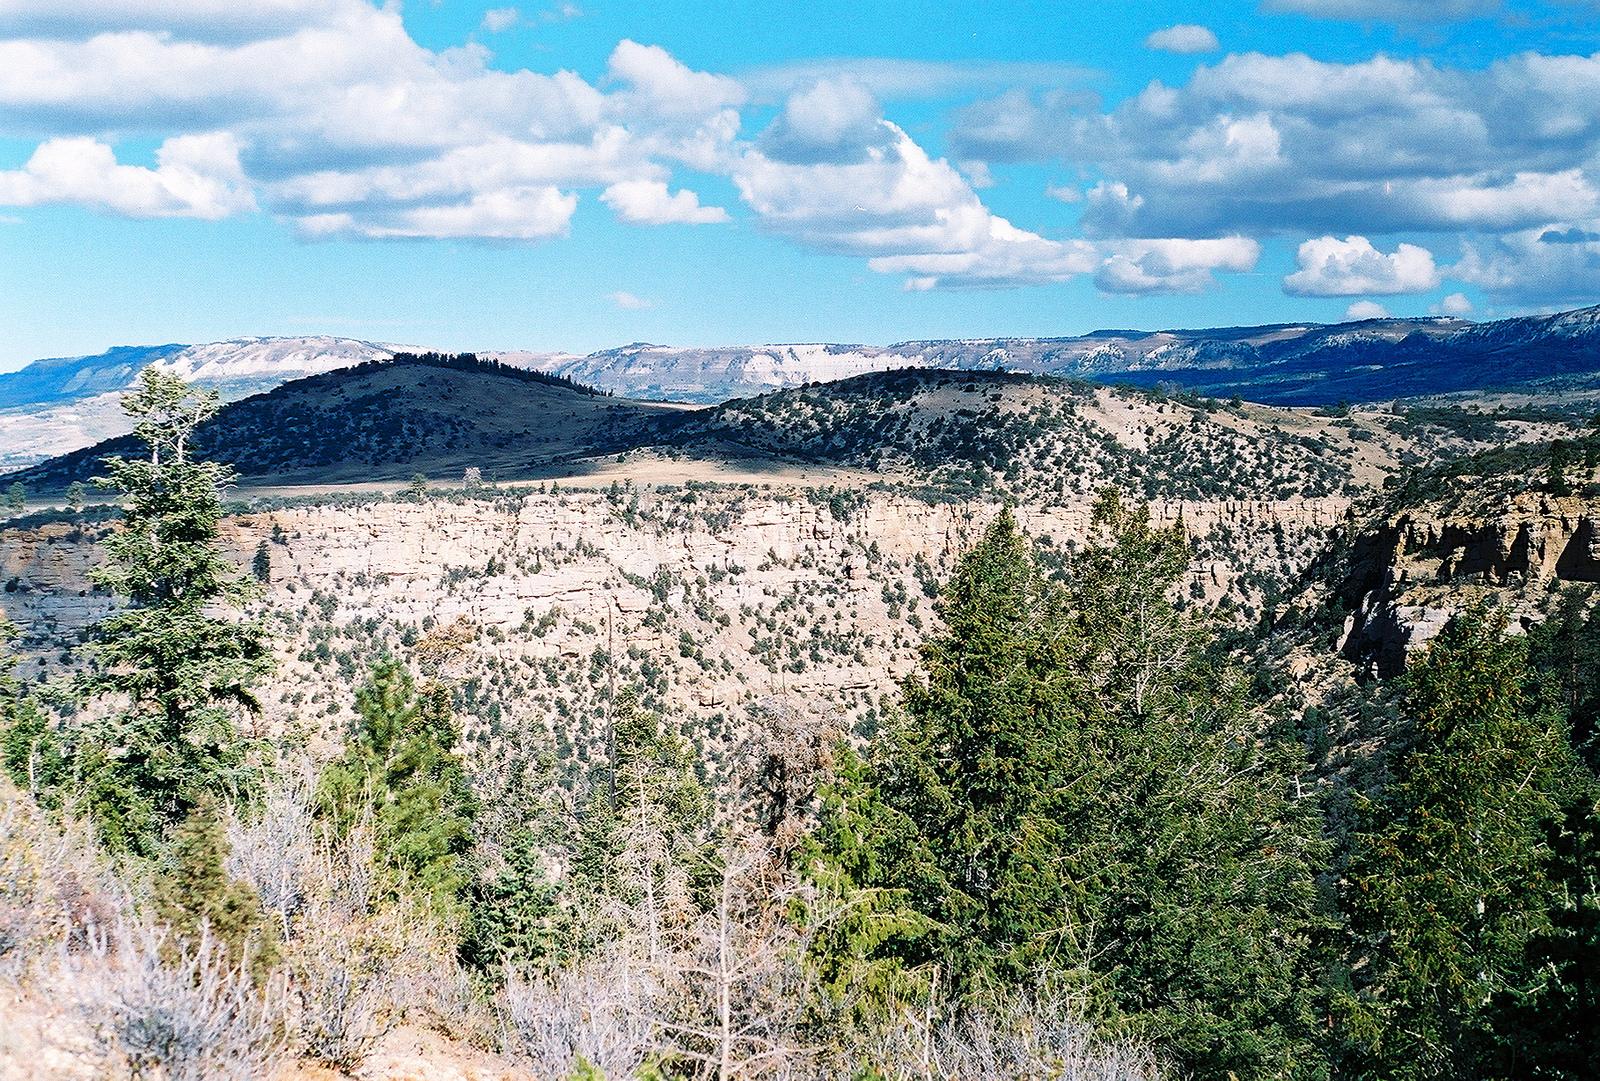 Interior Leases 1st of 14 U.S. Coal Strips Not Under Moratorium: 55M Tons in Utah Ntl. Forest